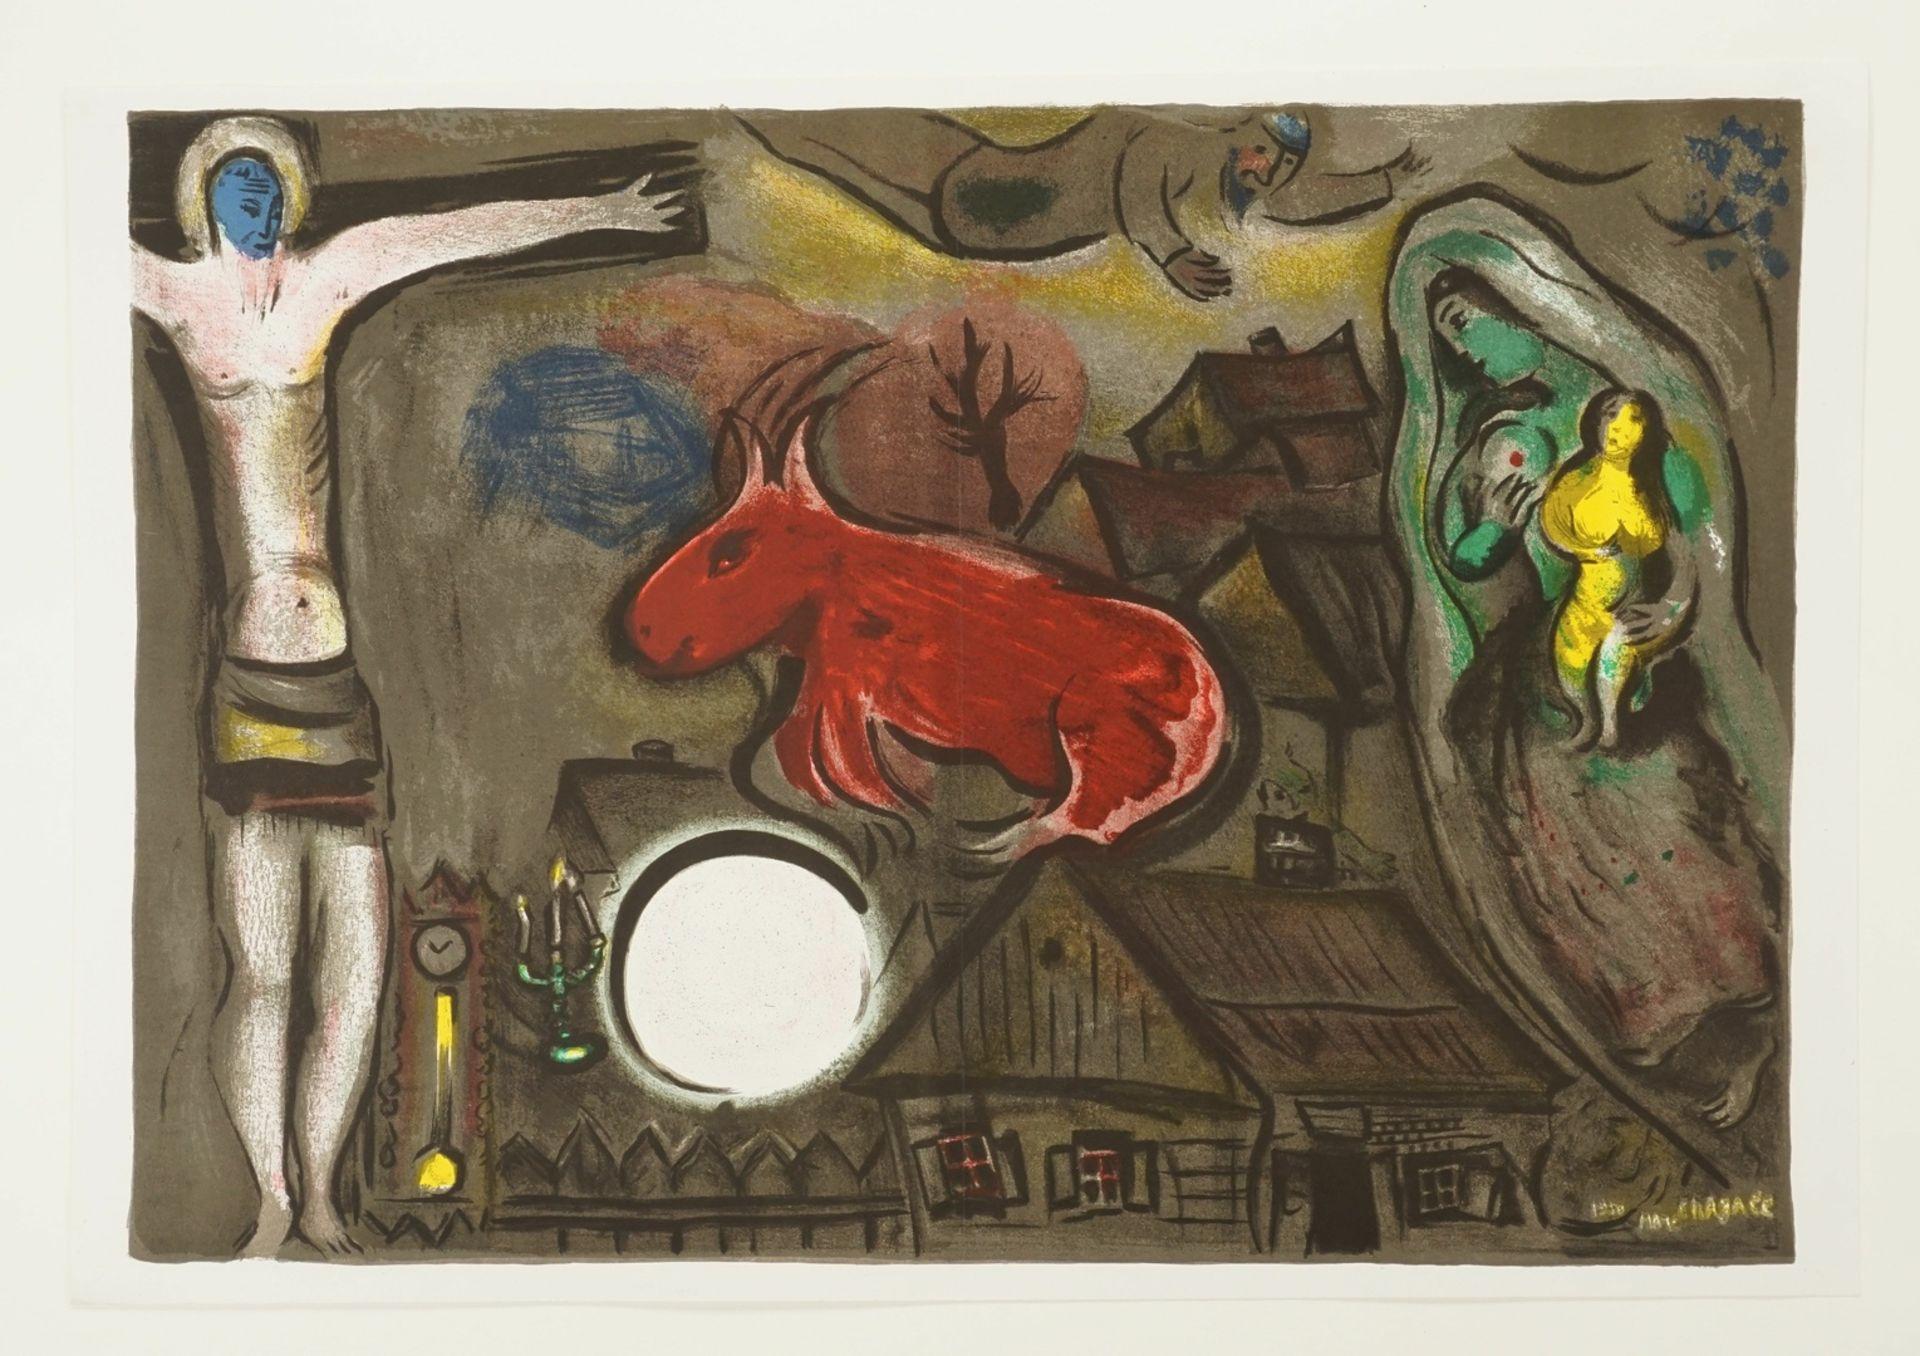 Marc Chagall, Vision mit roter Kuh - Bild 3 aus 5